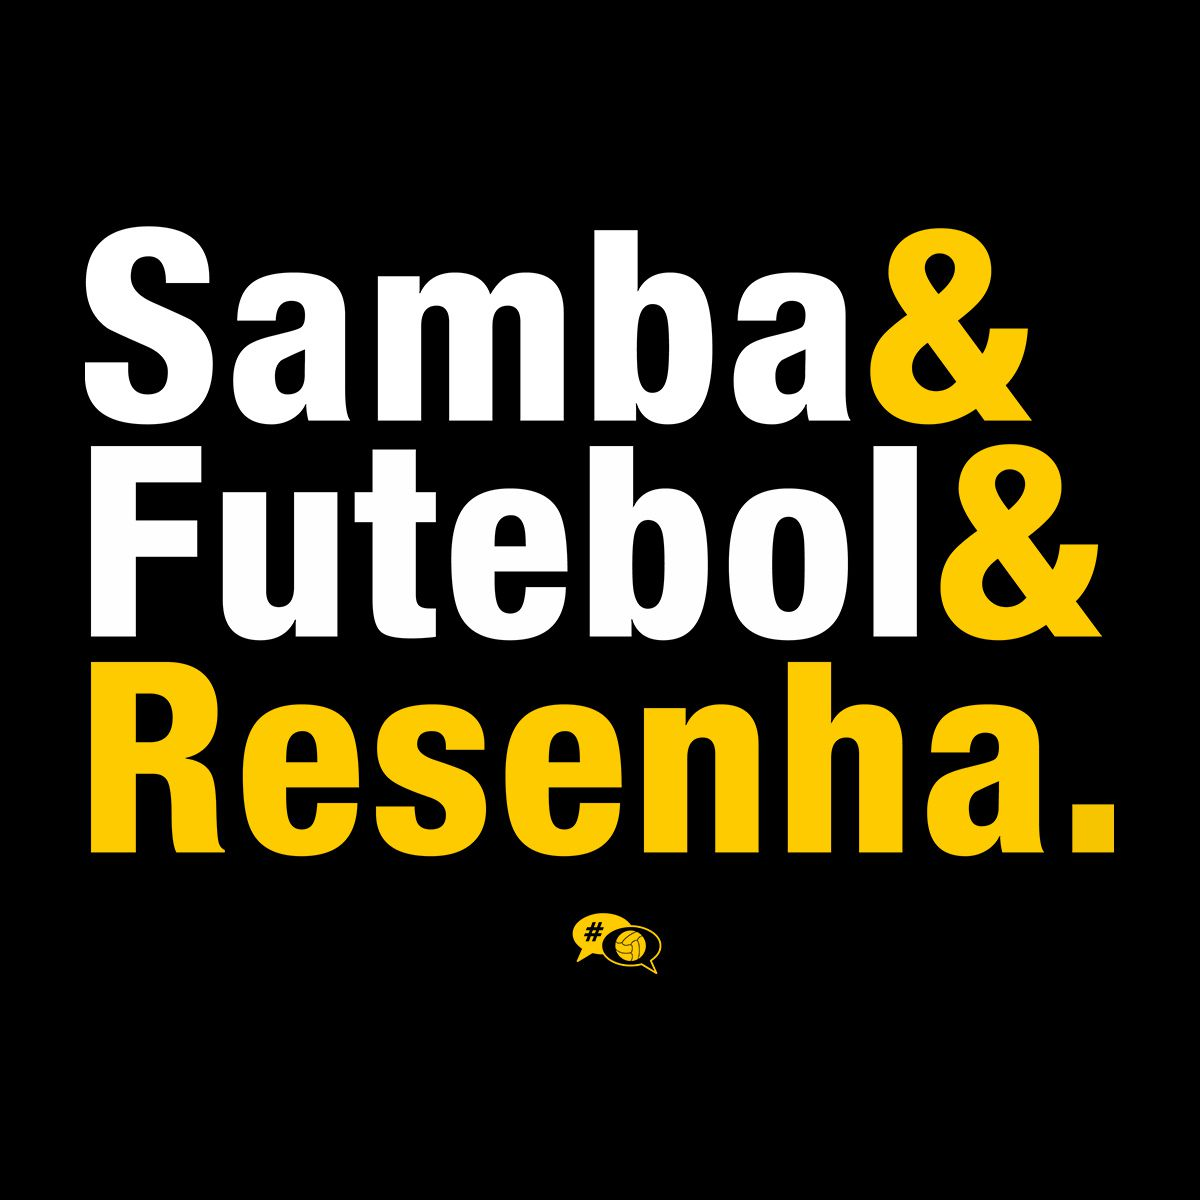 Camiseta - SAMBA, FUTEBOL E RESENHA,  Feminina